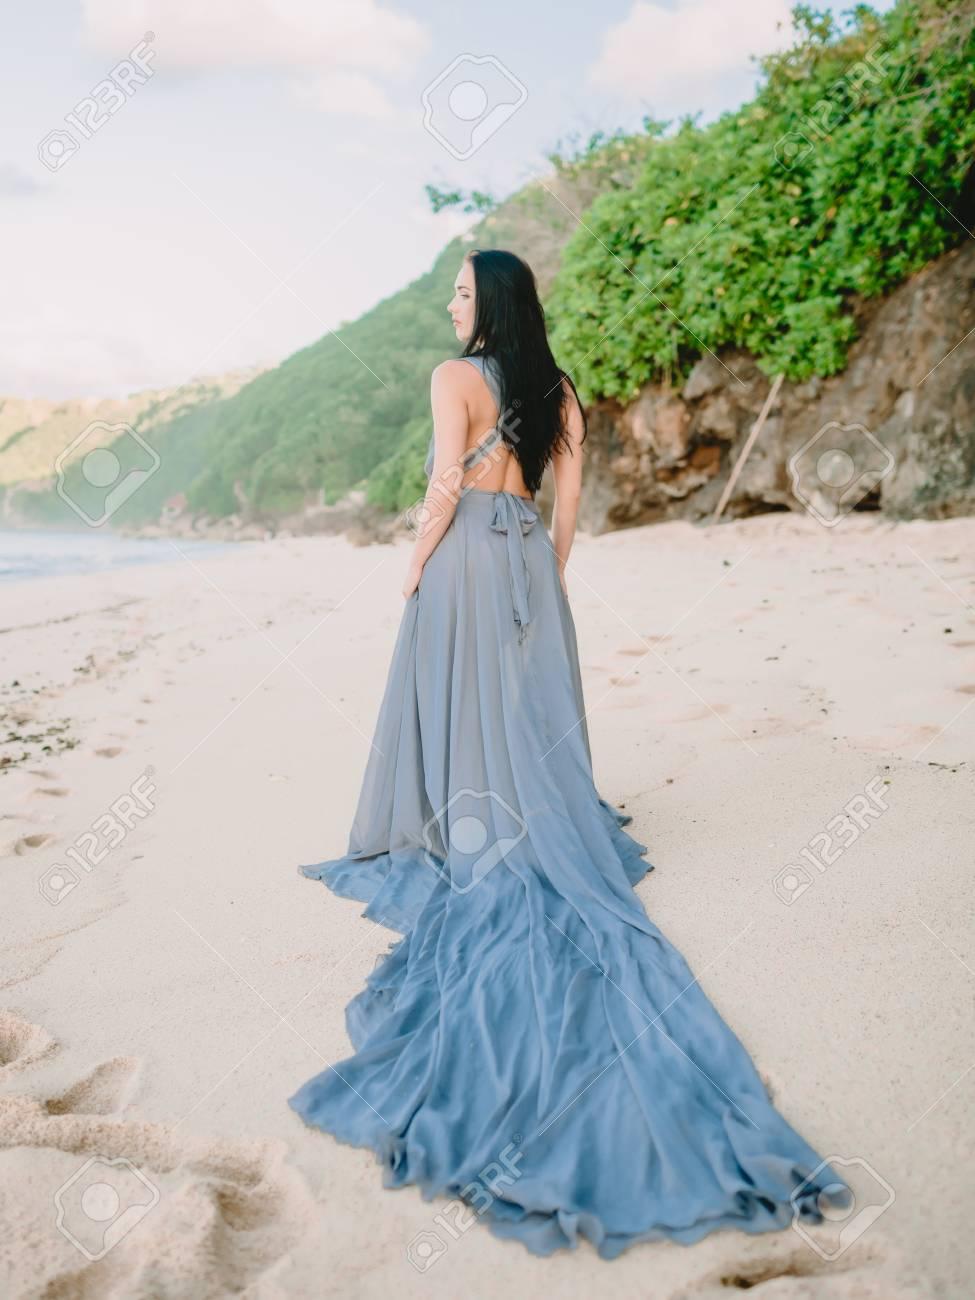 Blue Wedding Dress At The Beach